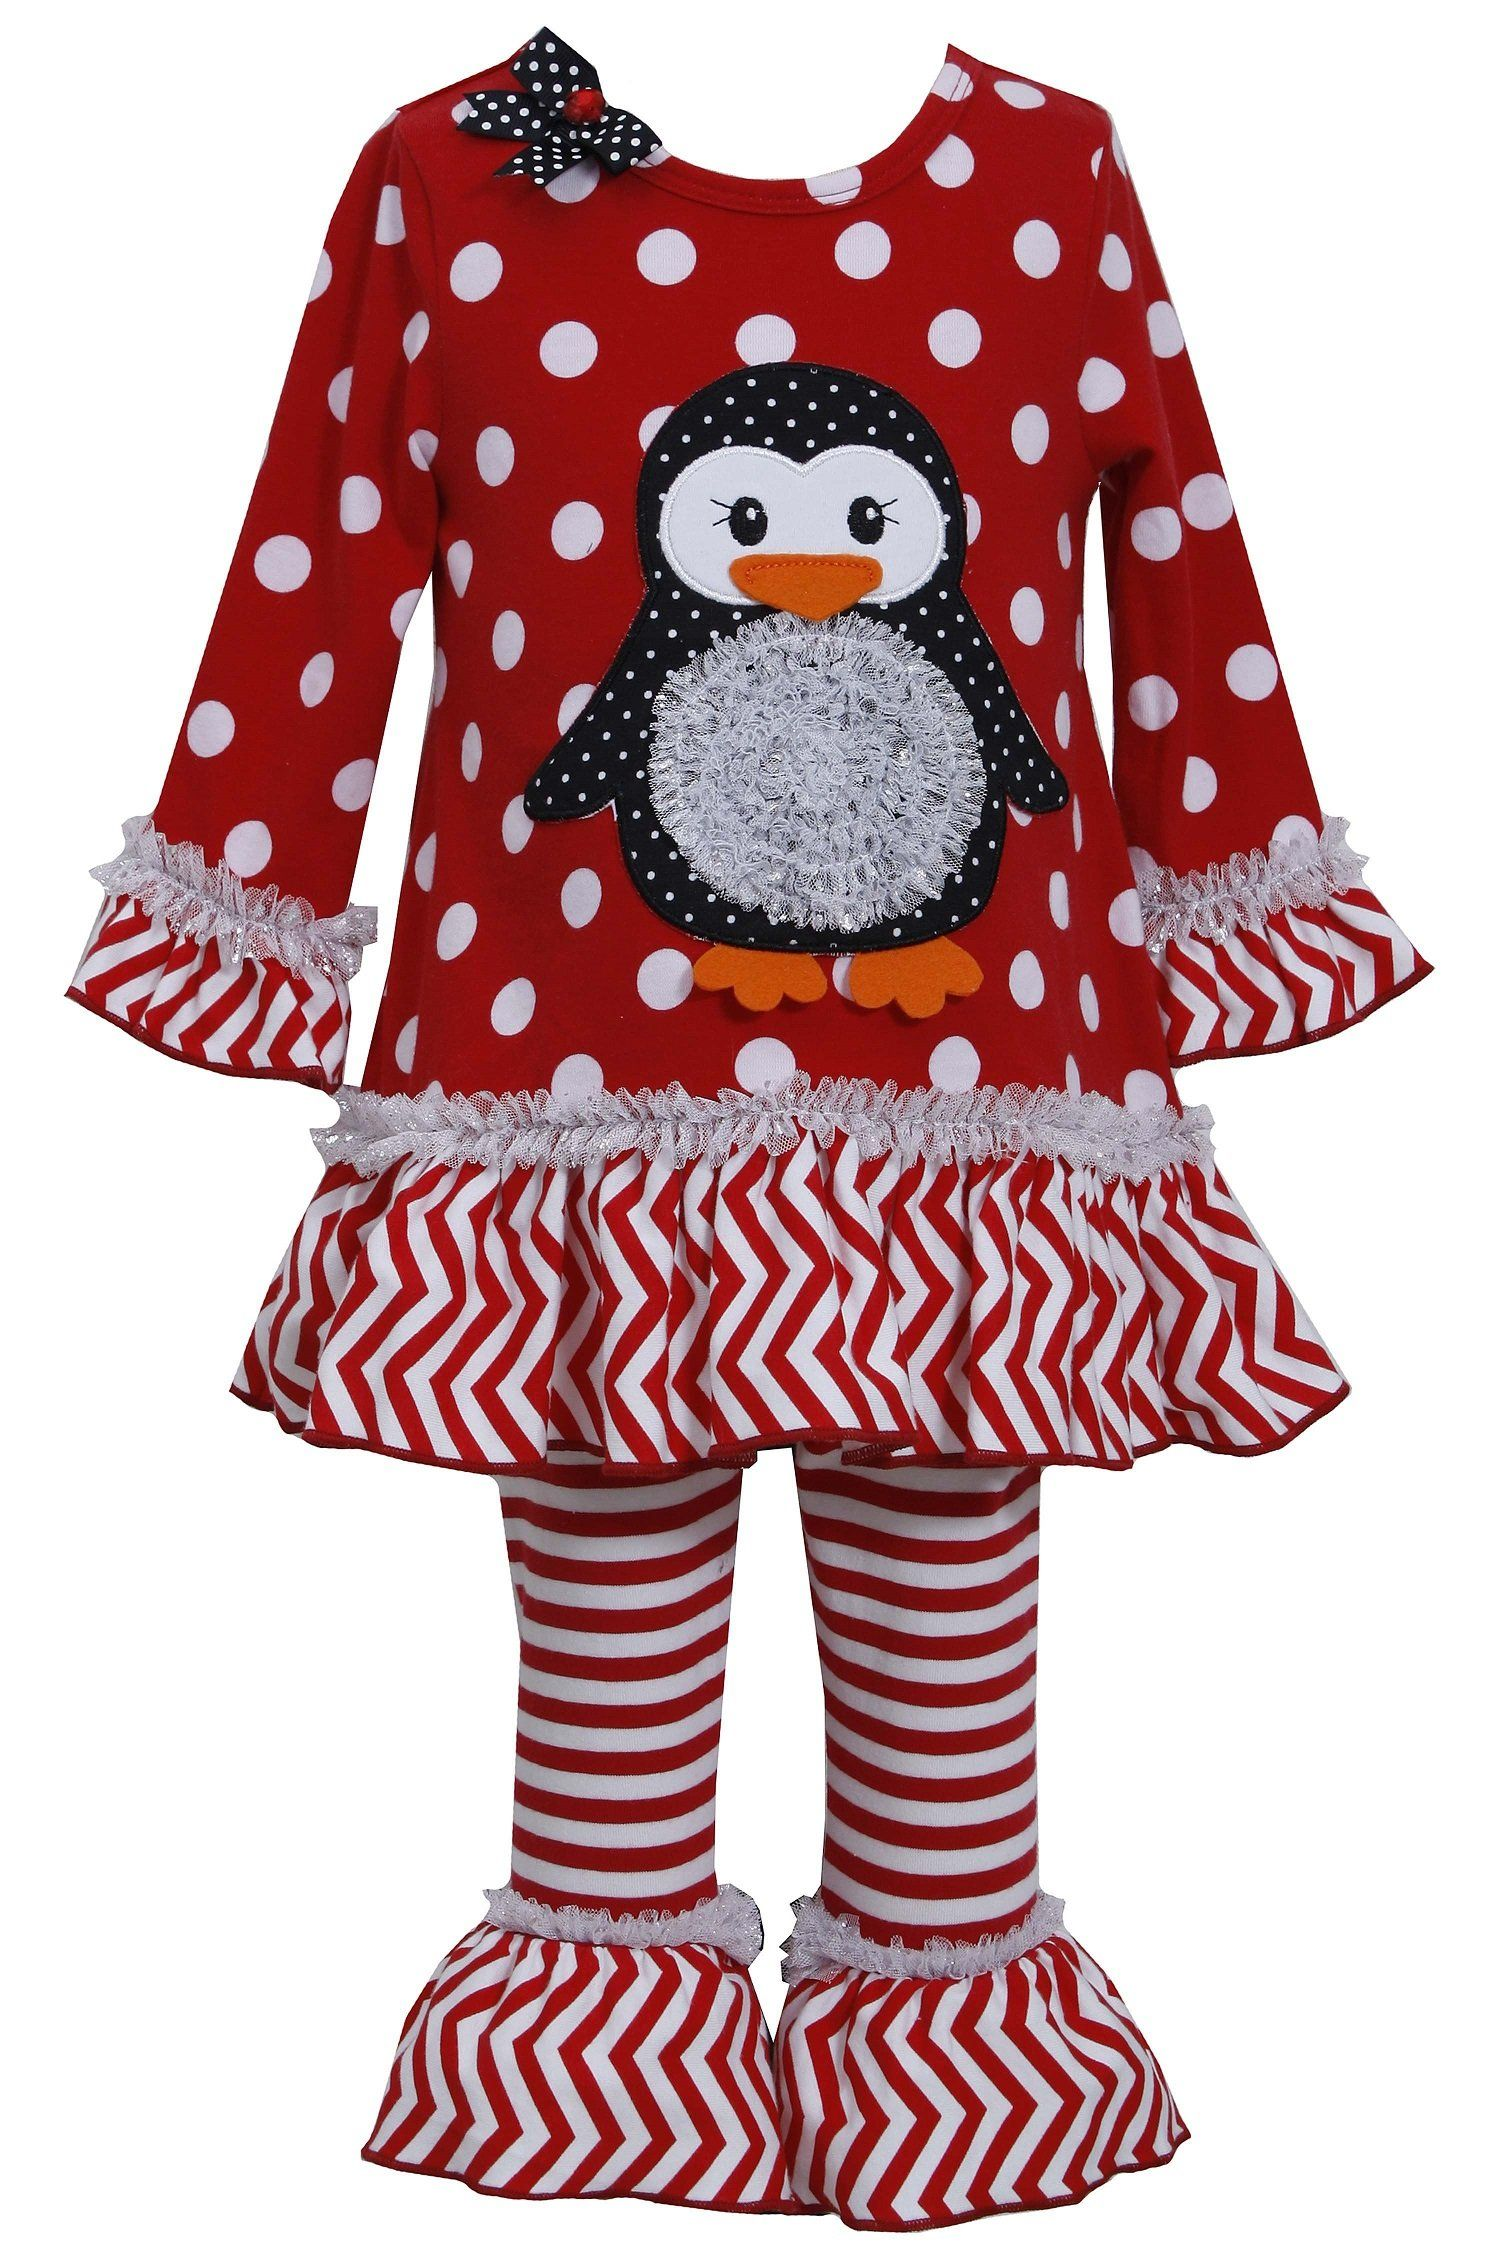 4e4baf173f88 Bonnie Jean Girls 2T - 6X Red Christmas Penguin Dress Legging Outfit.  Beautiful 2-